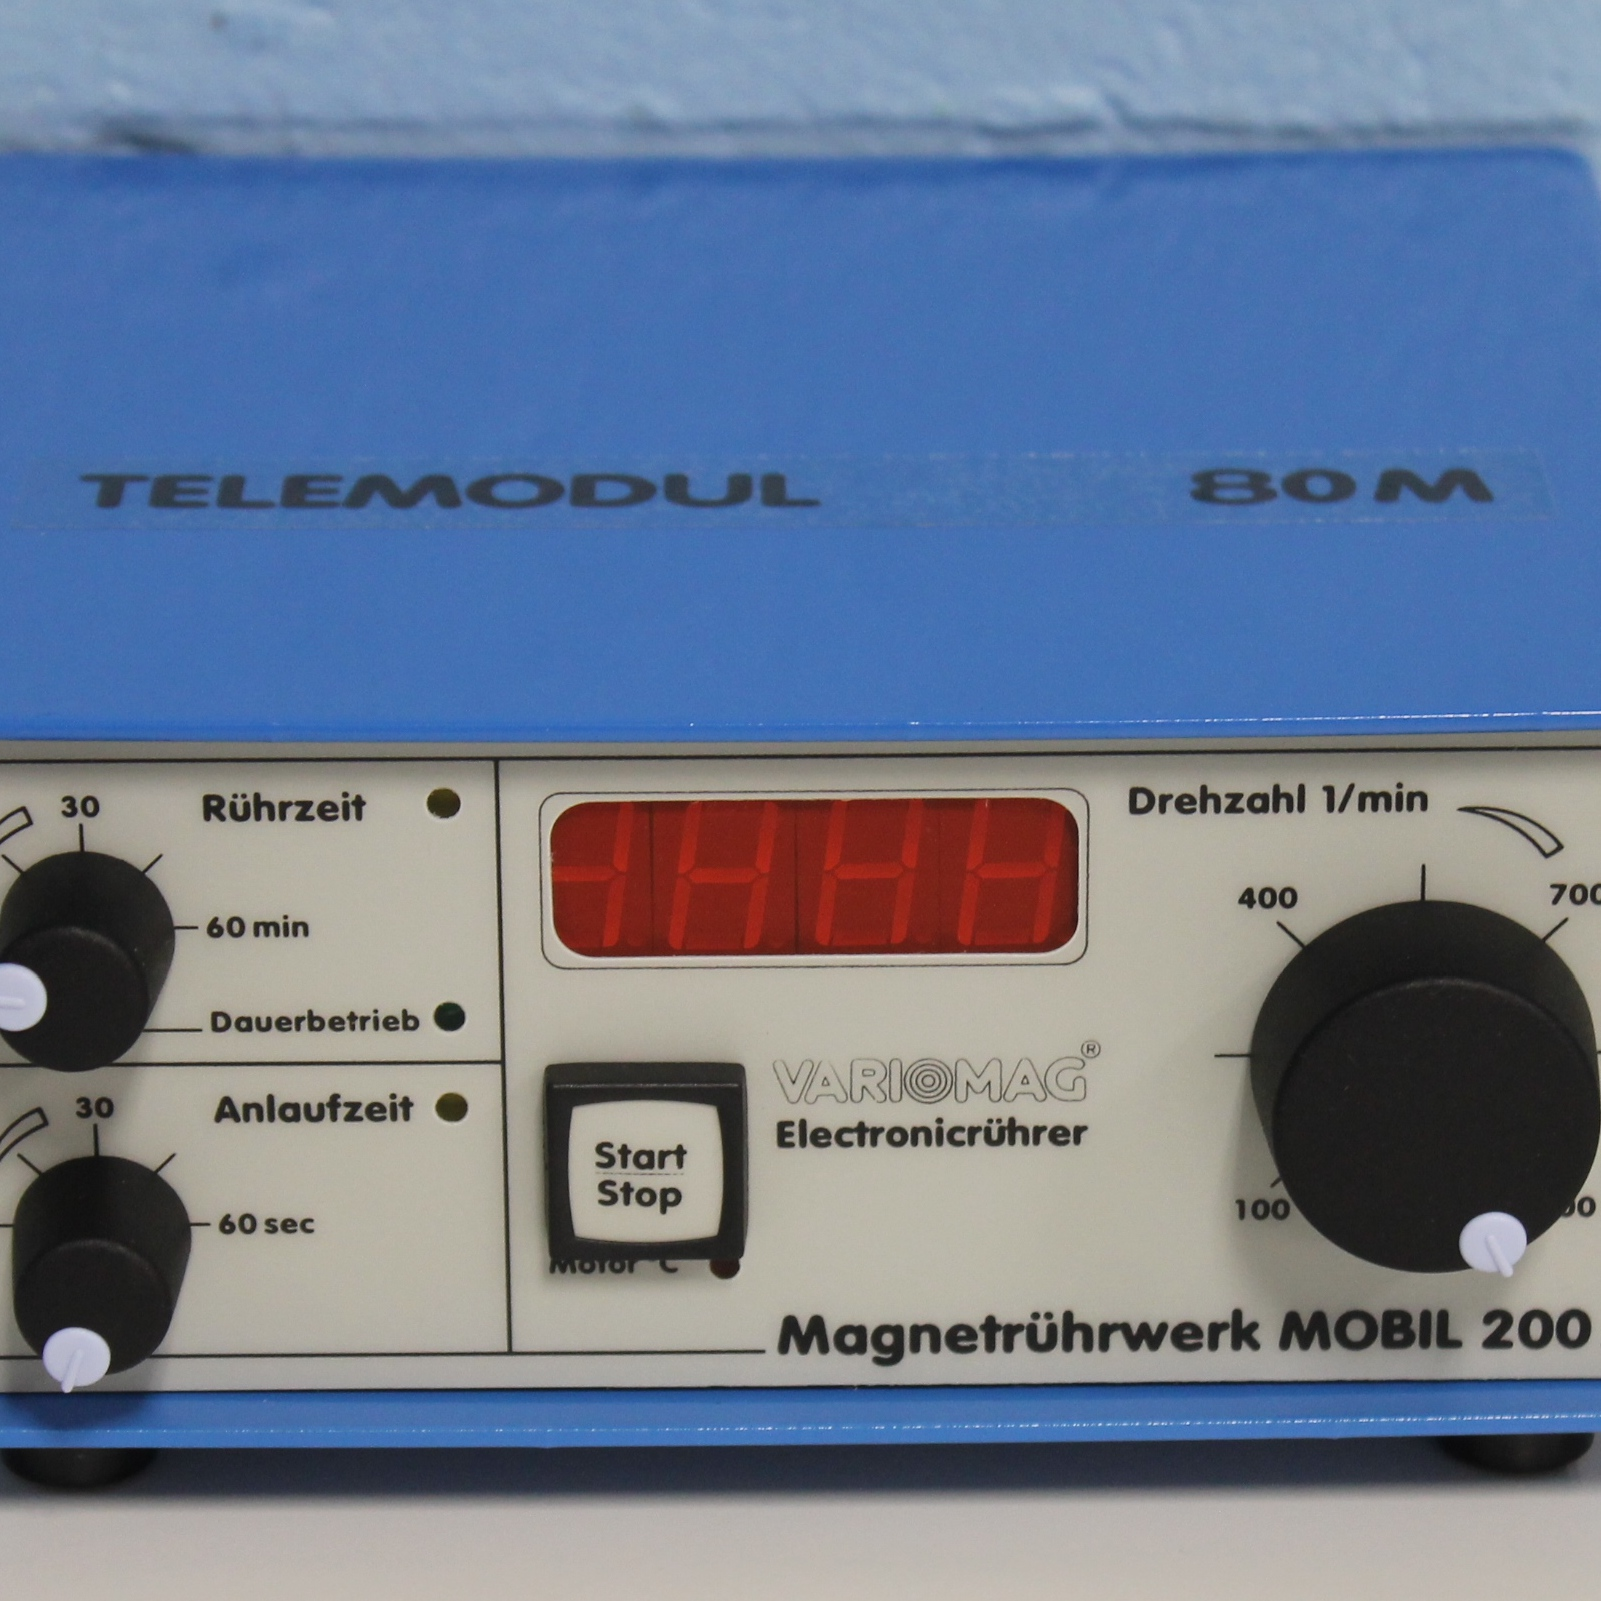 Variomag Control Unit Telemodule 80 M 80 Watt Image